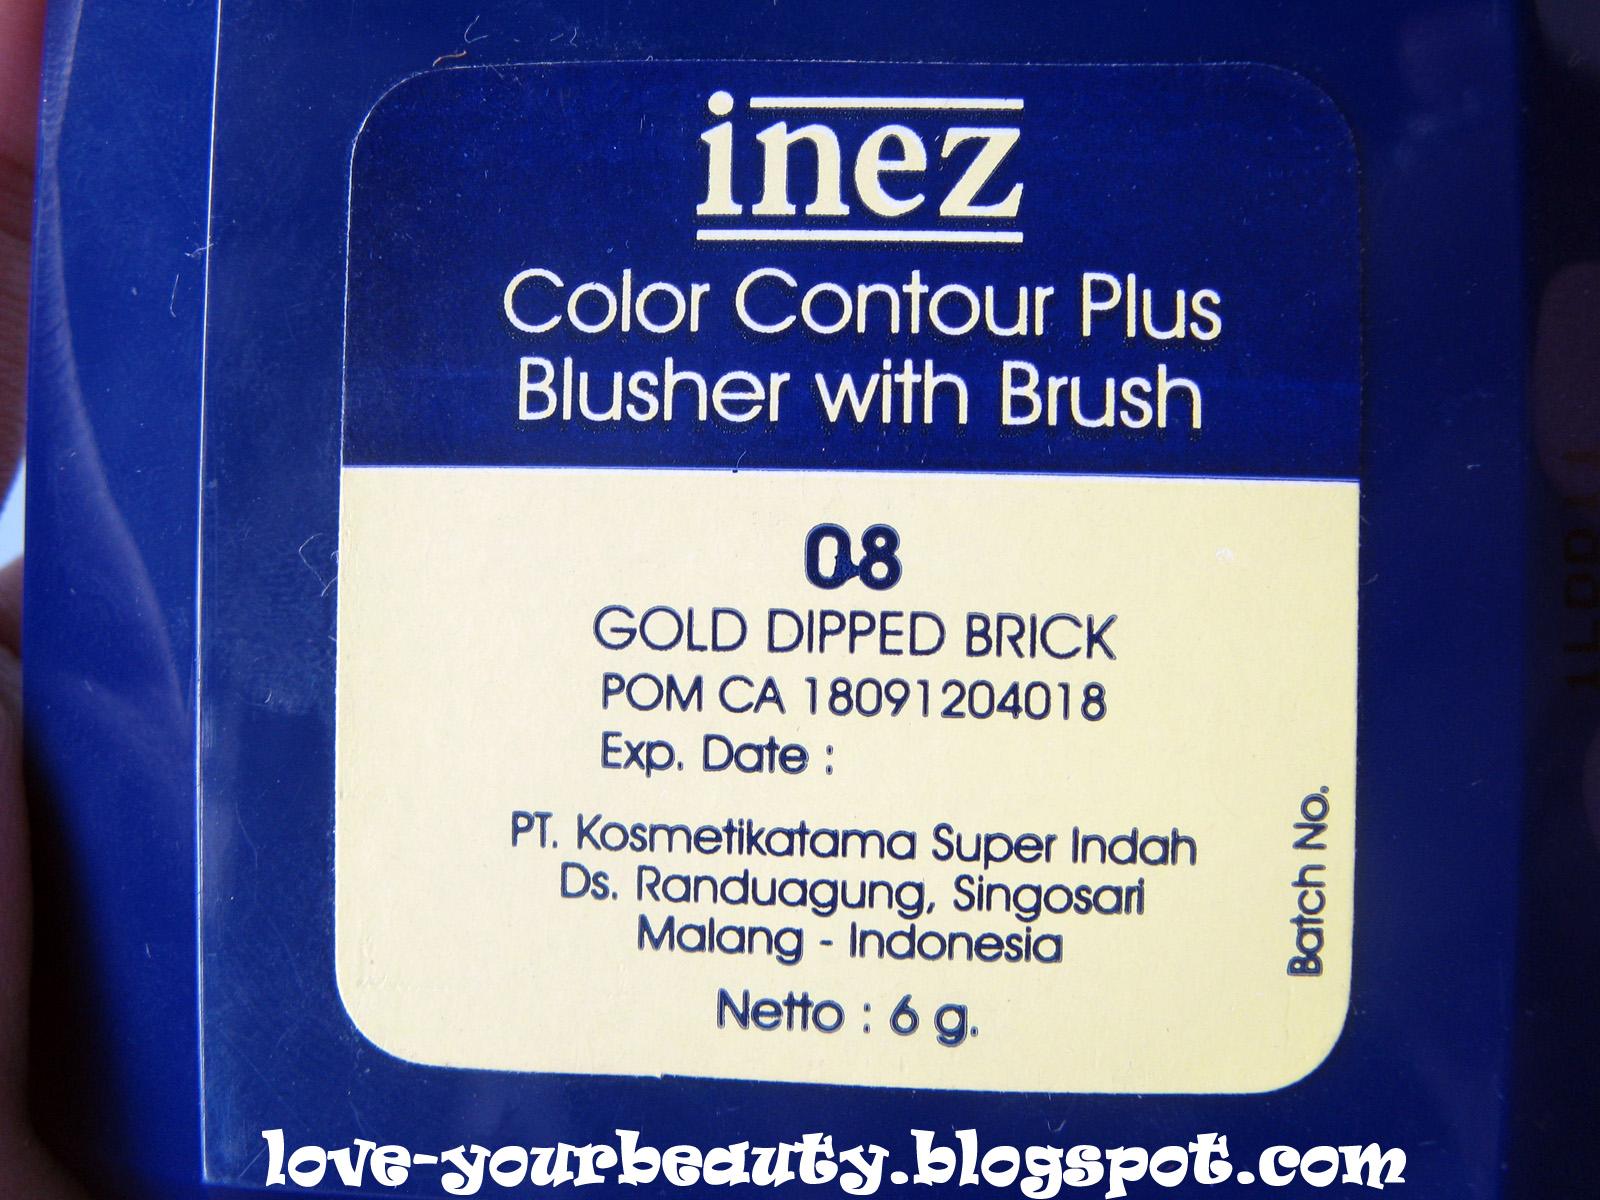 Inez Blusher 08 Gold Dipped Daftar Harga Terkini Dan Terlengkap Contour Plus Lipstick Riviera Blush Bagian Belakang Kemasan